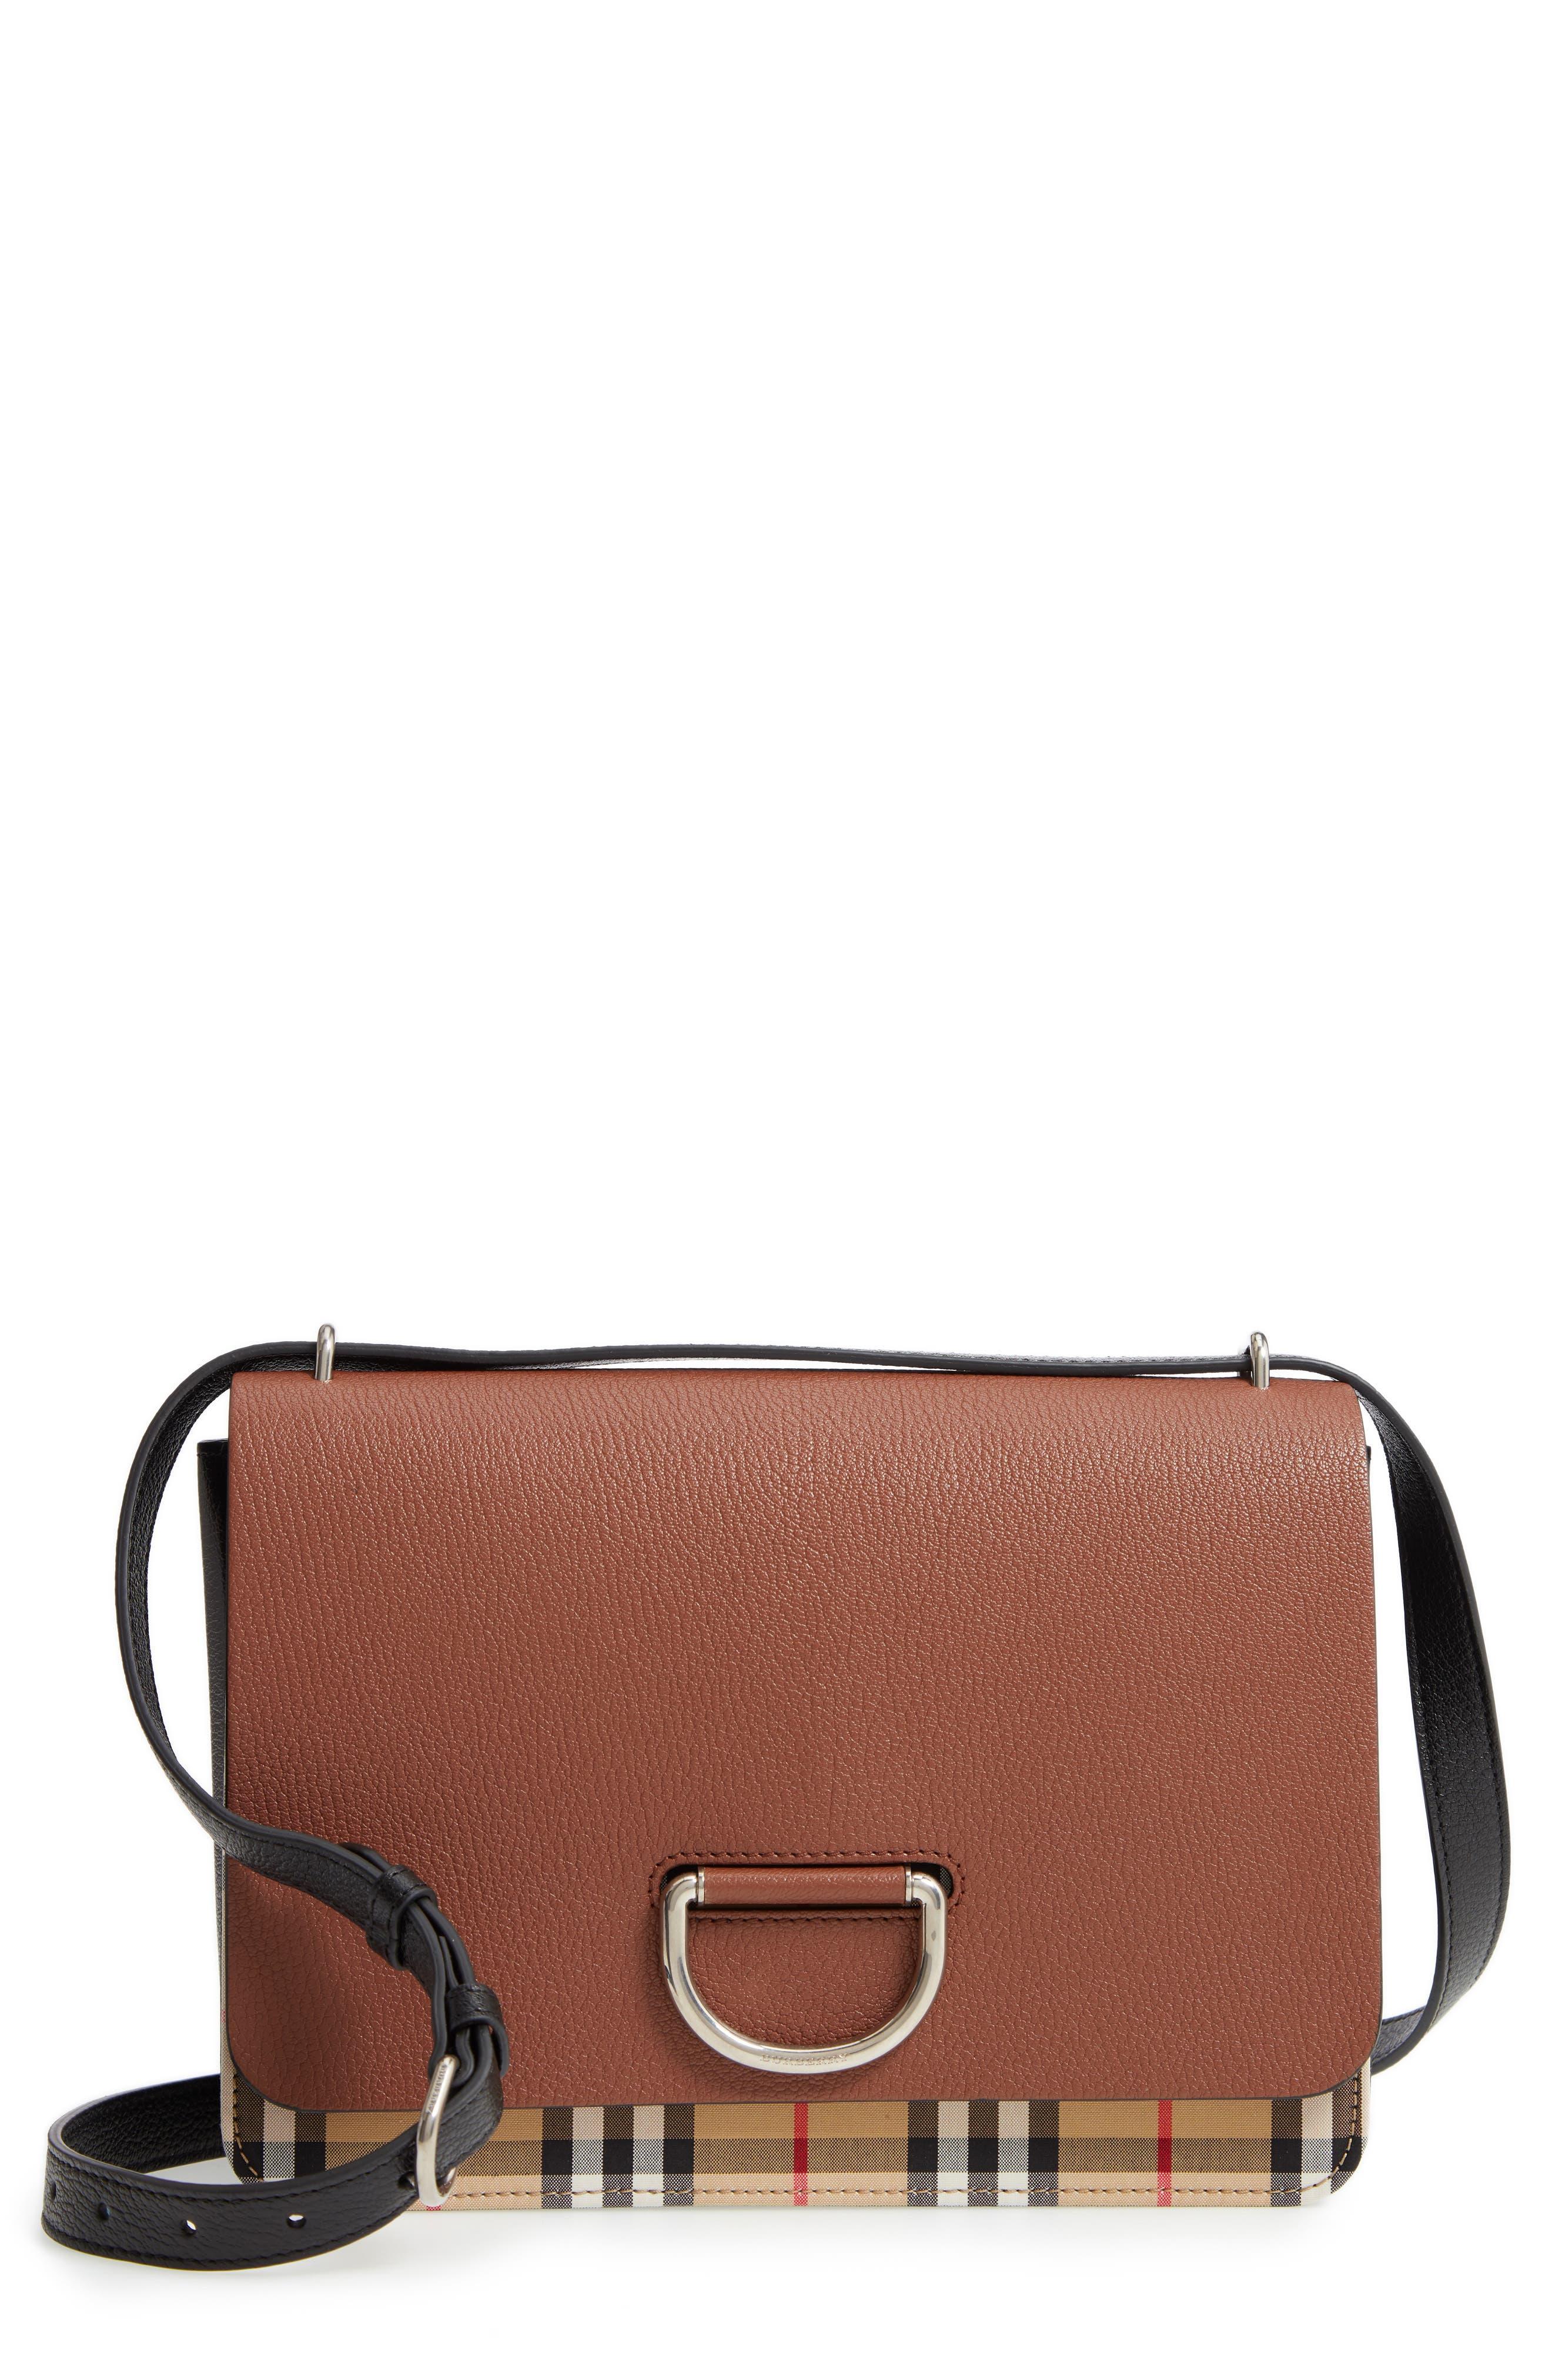 Medium D-Ring Vintage Check & Leather Crossbody Bag,                             Main thumbnail 1, color,                             TAN/ BLACK